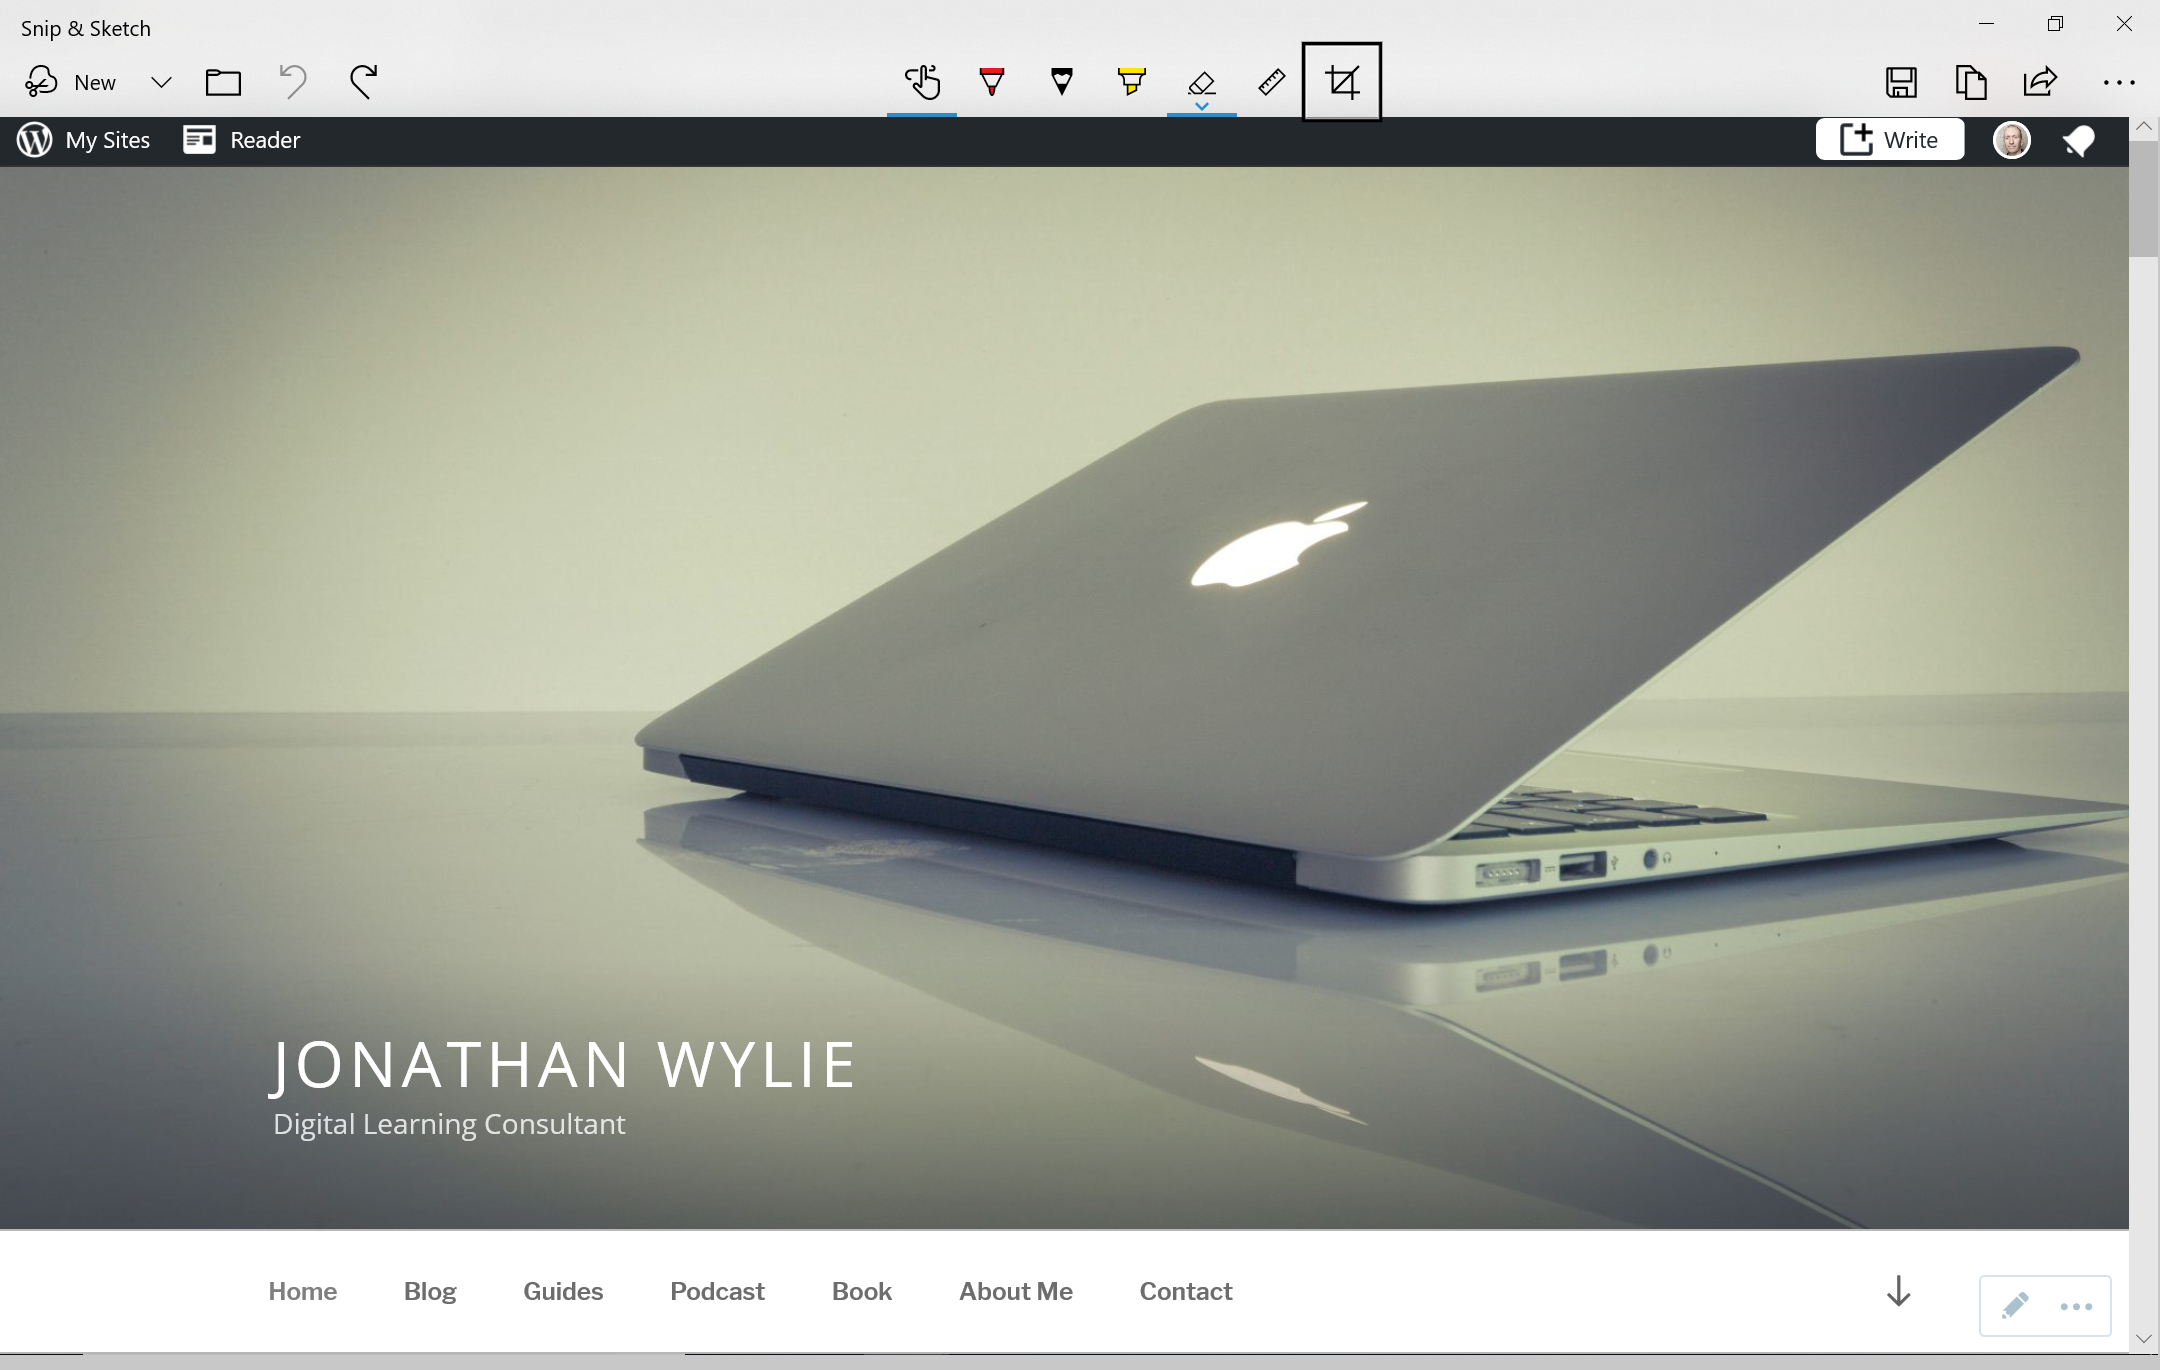 Snip & Sketch: The Windows 10 Screenshot Tool – Jonathan Wylie